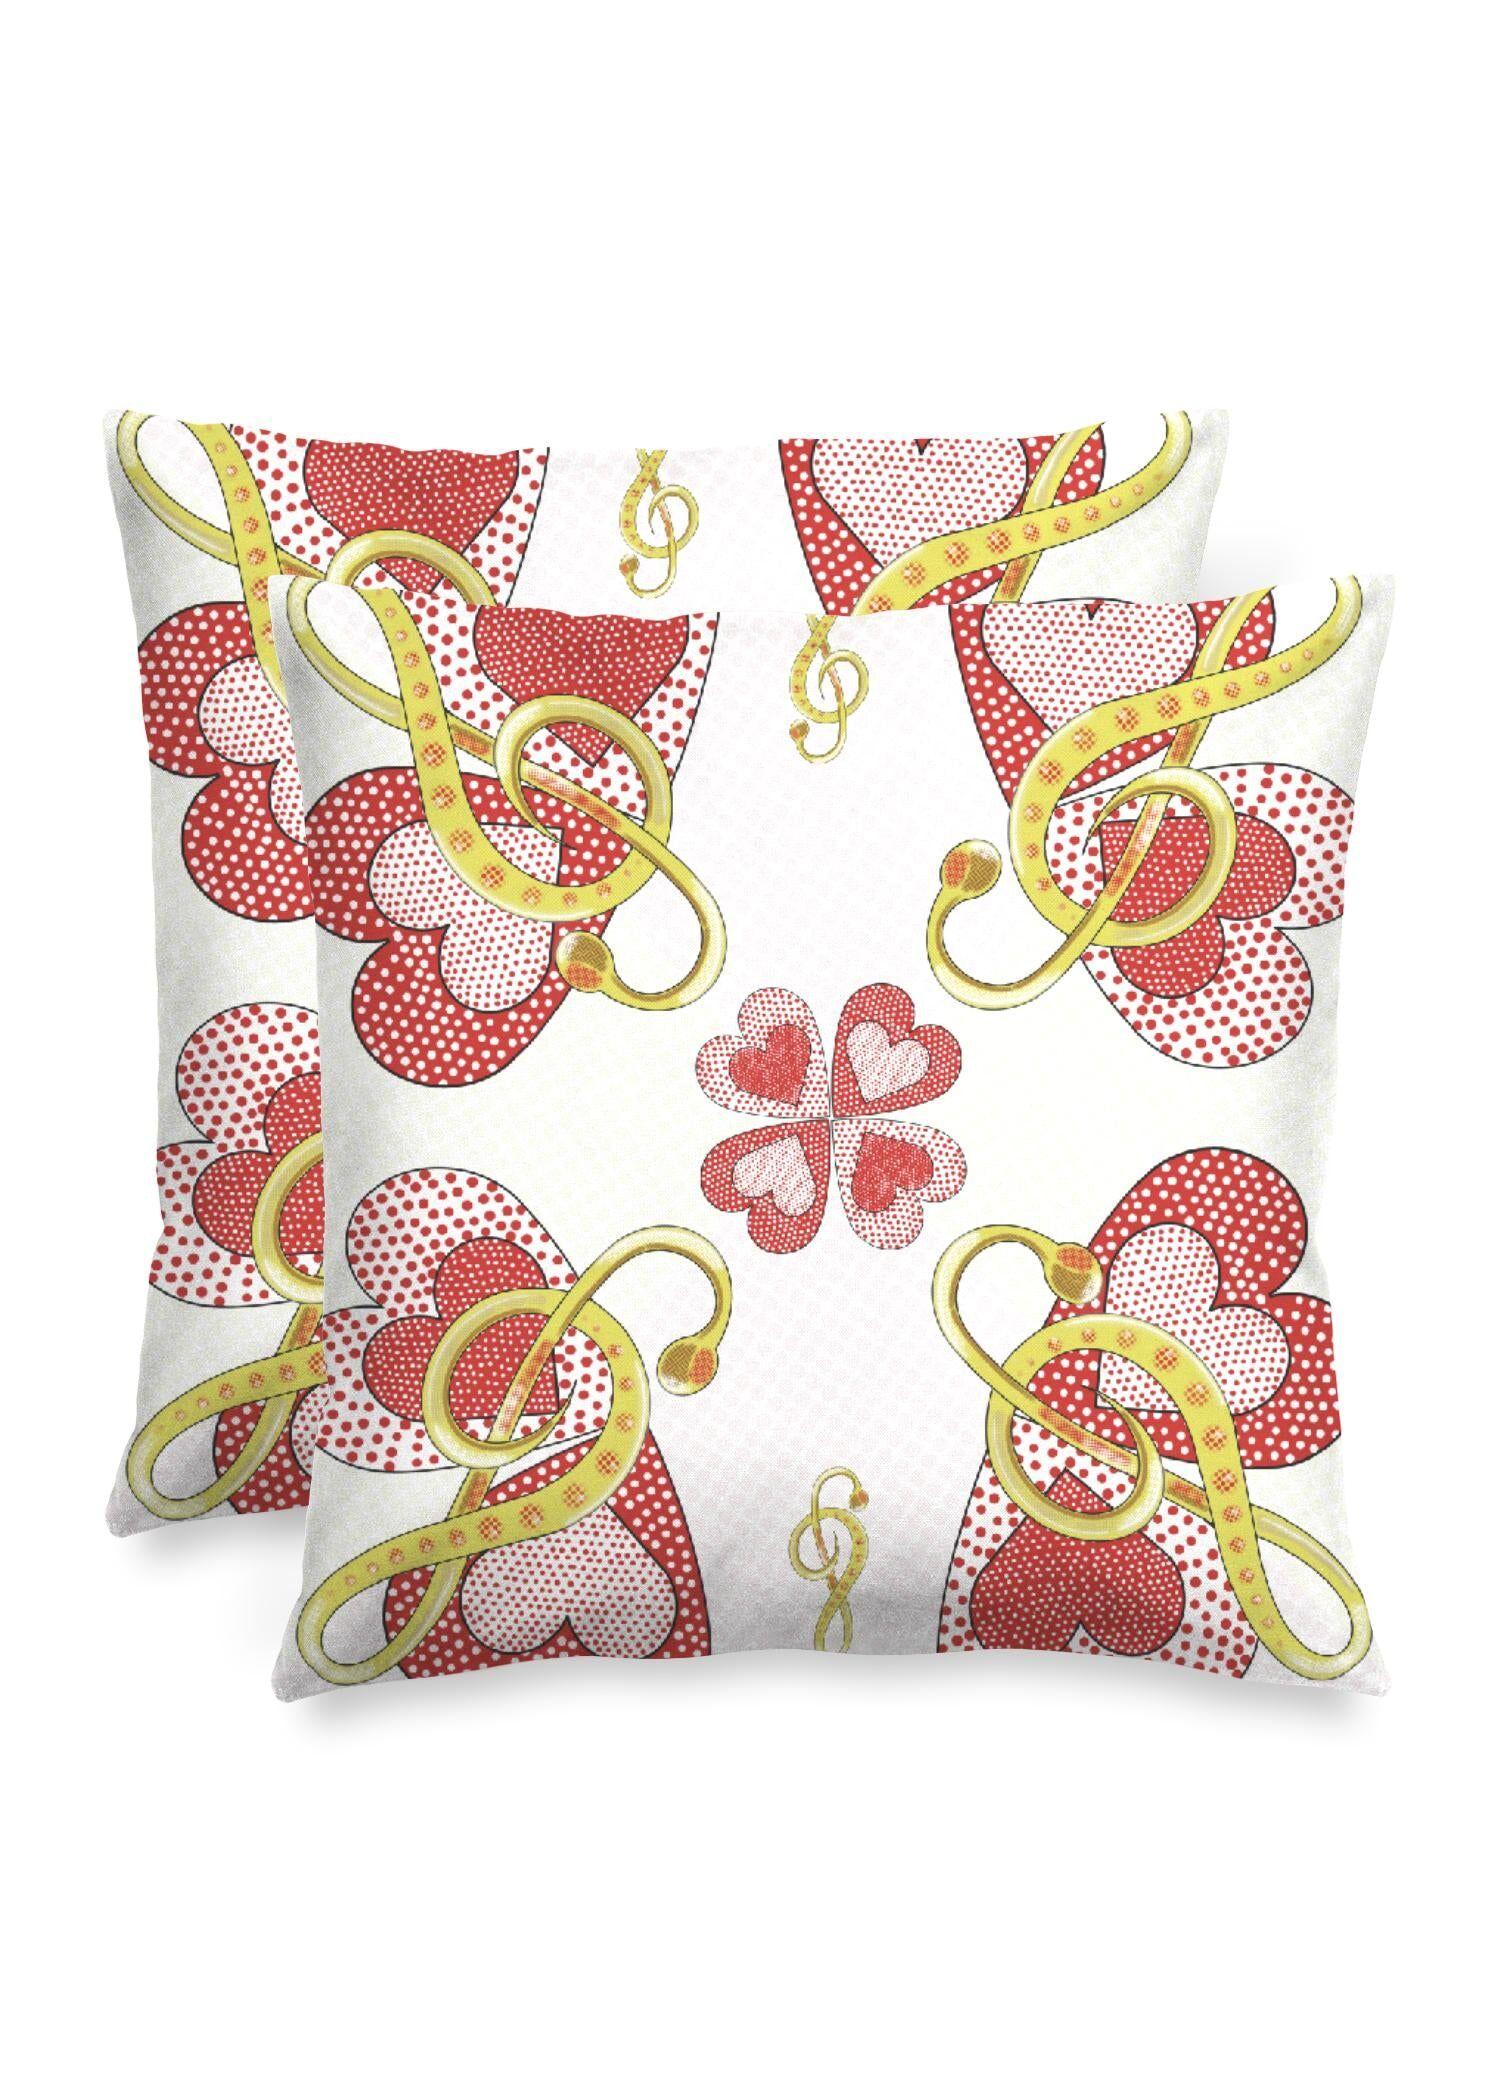 "VIDA Square Pillow - Music by VIDA Original Artist  - Size: Matte / 16"" / Single"